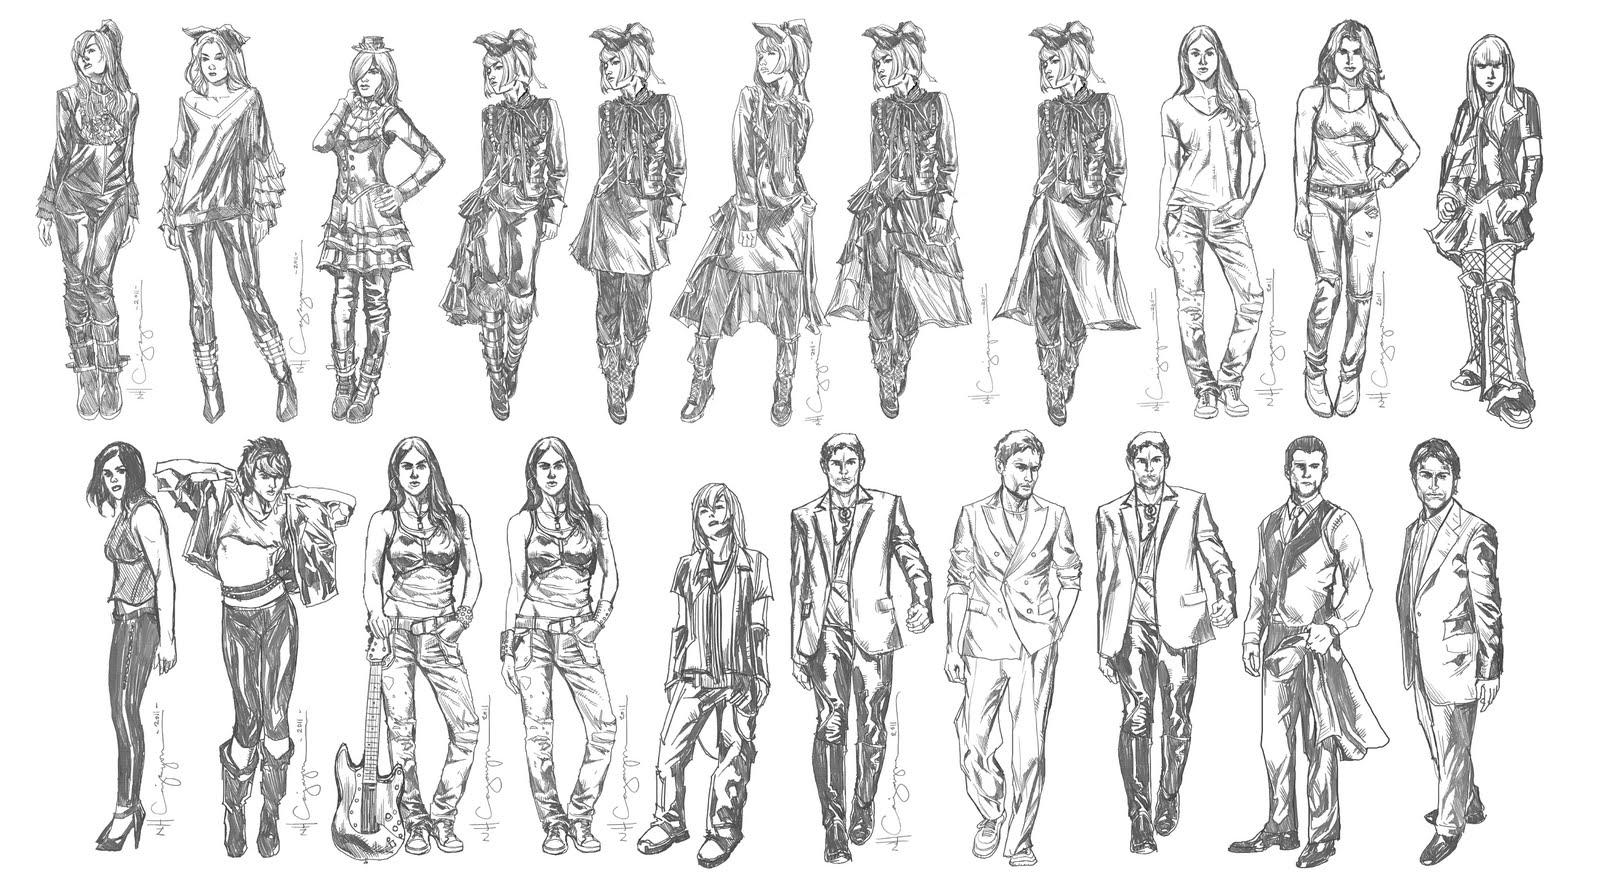 Character Design Artwork : Nhc art fantasy character design